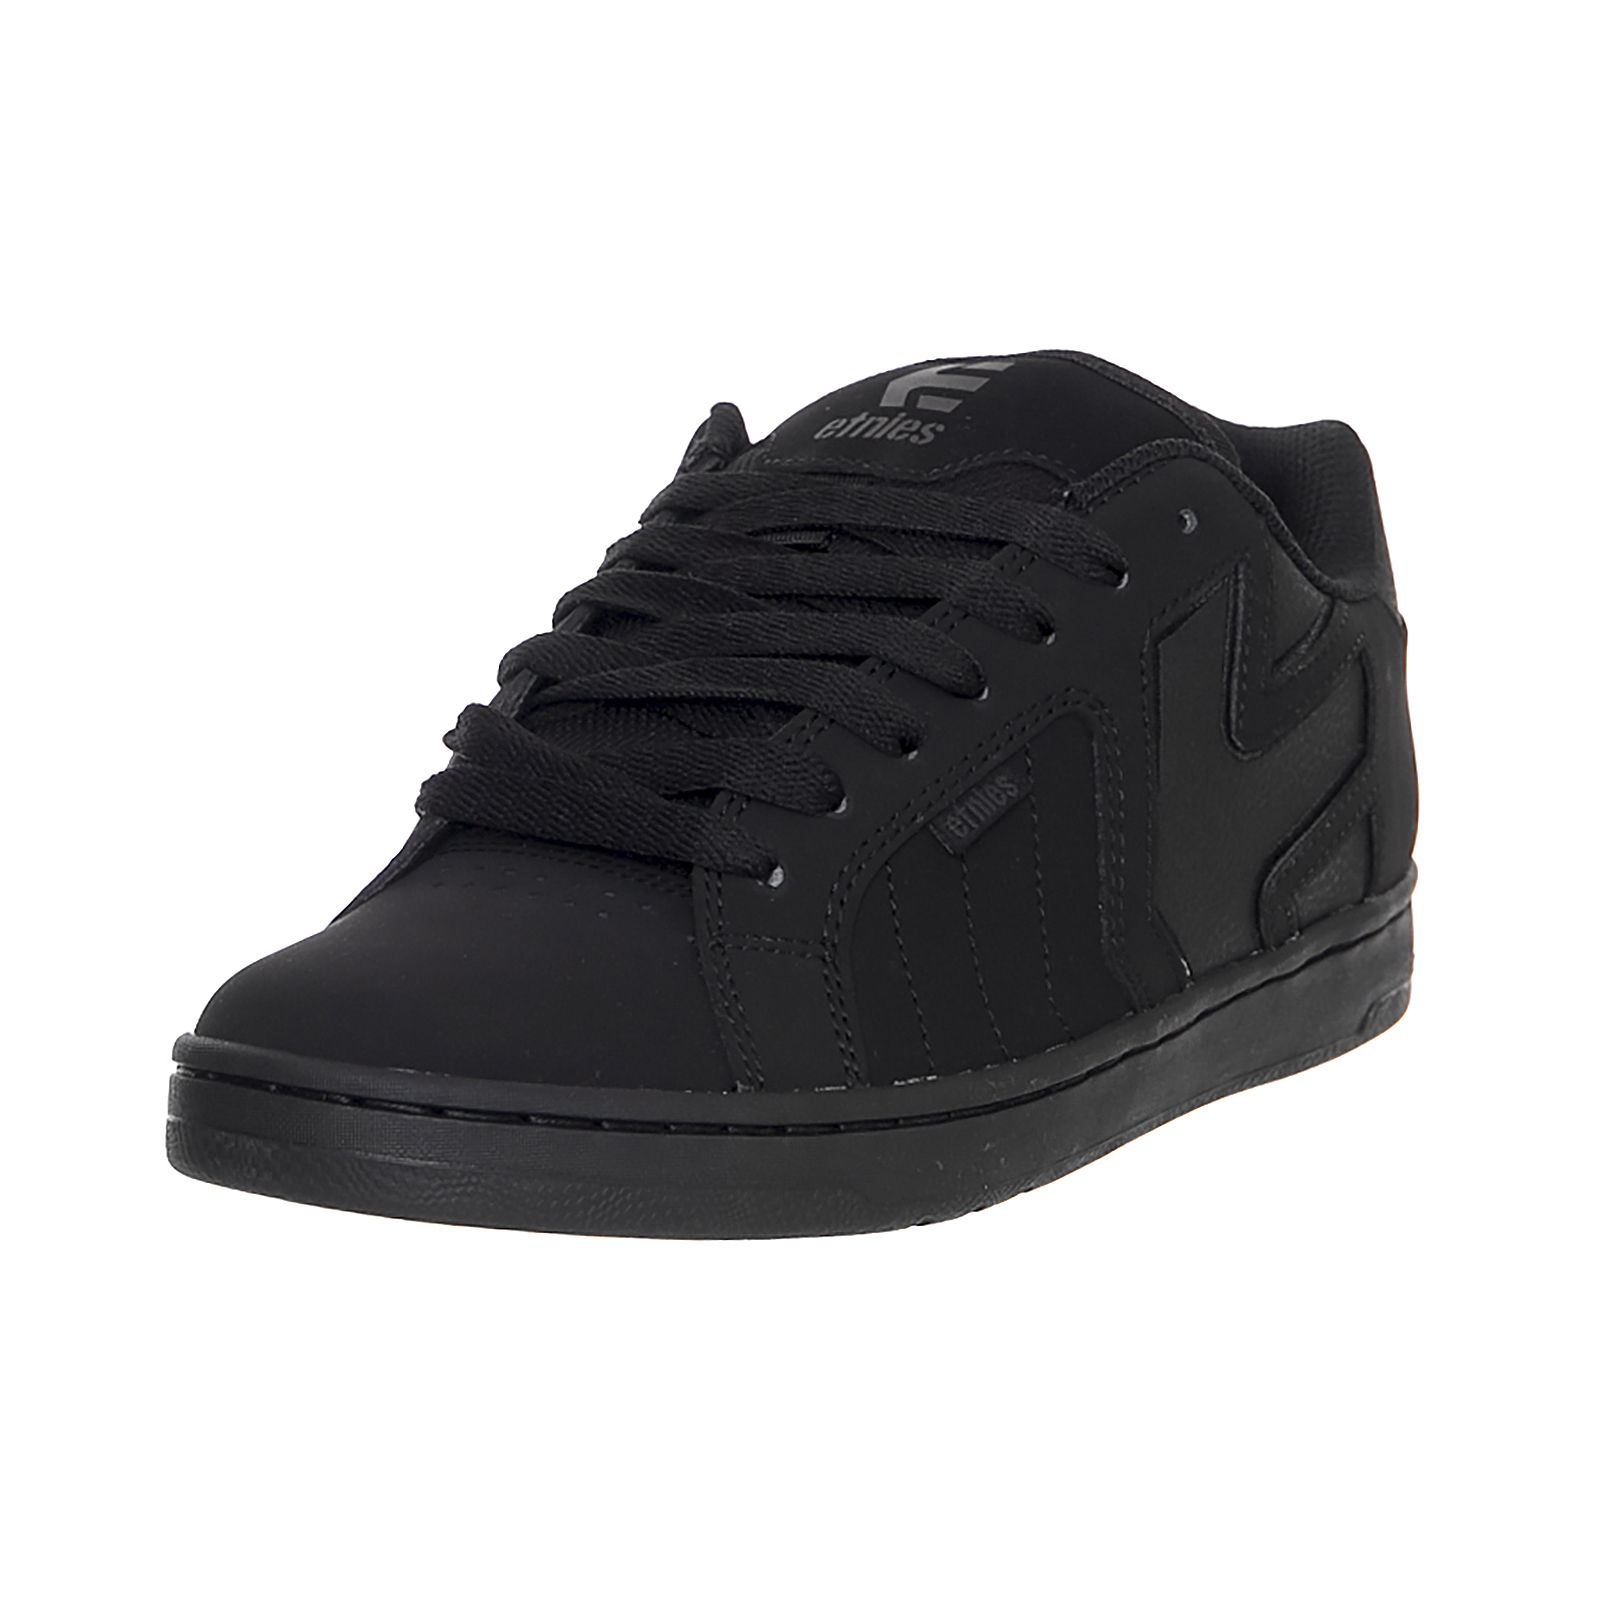 Etnies Turnschuhe Fader 2 black/black/black schwarz